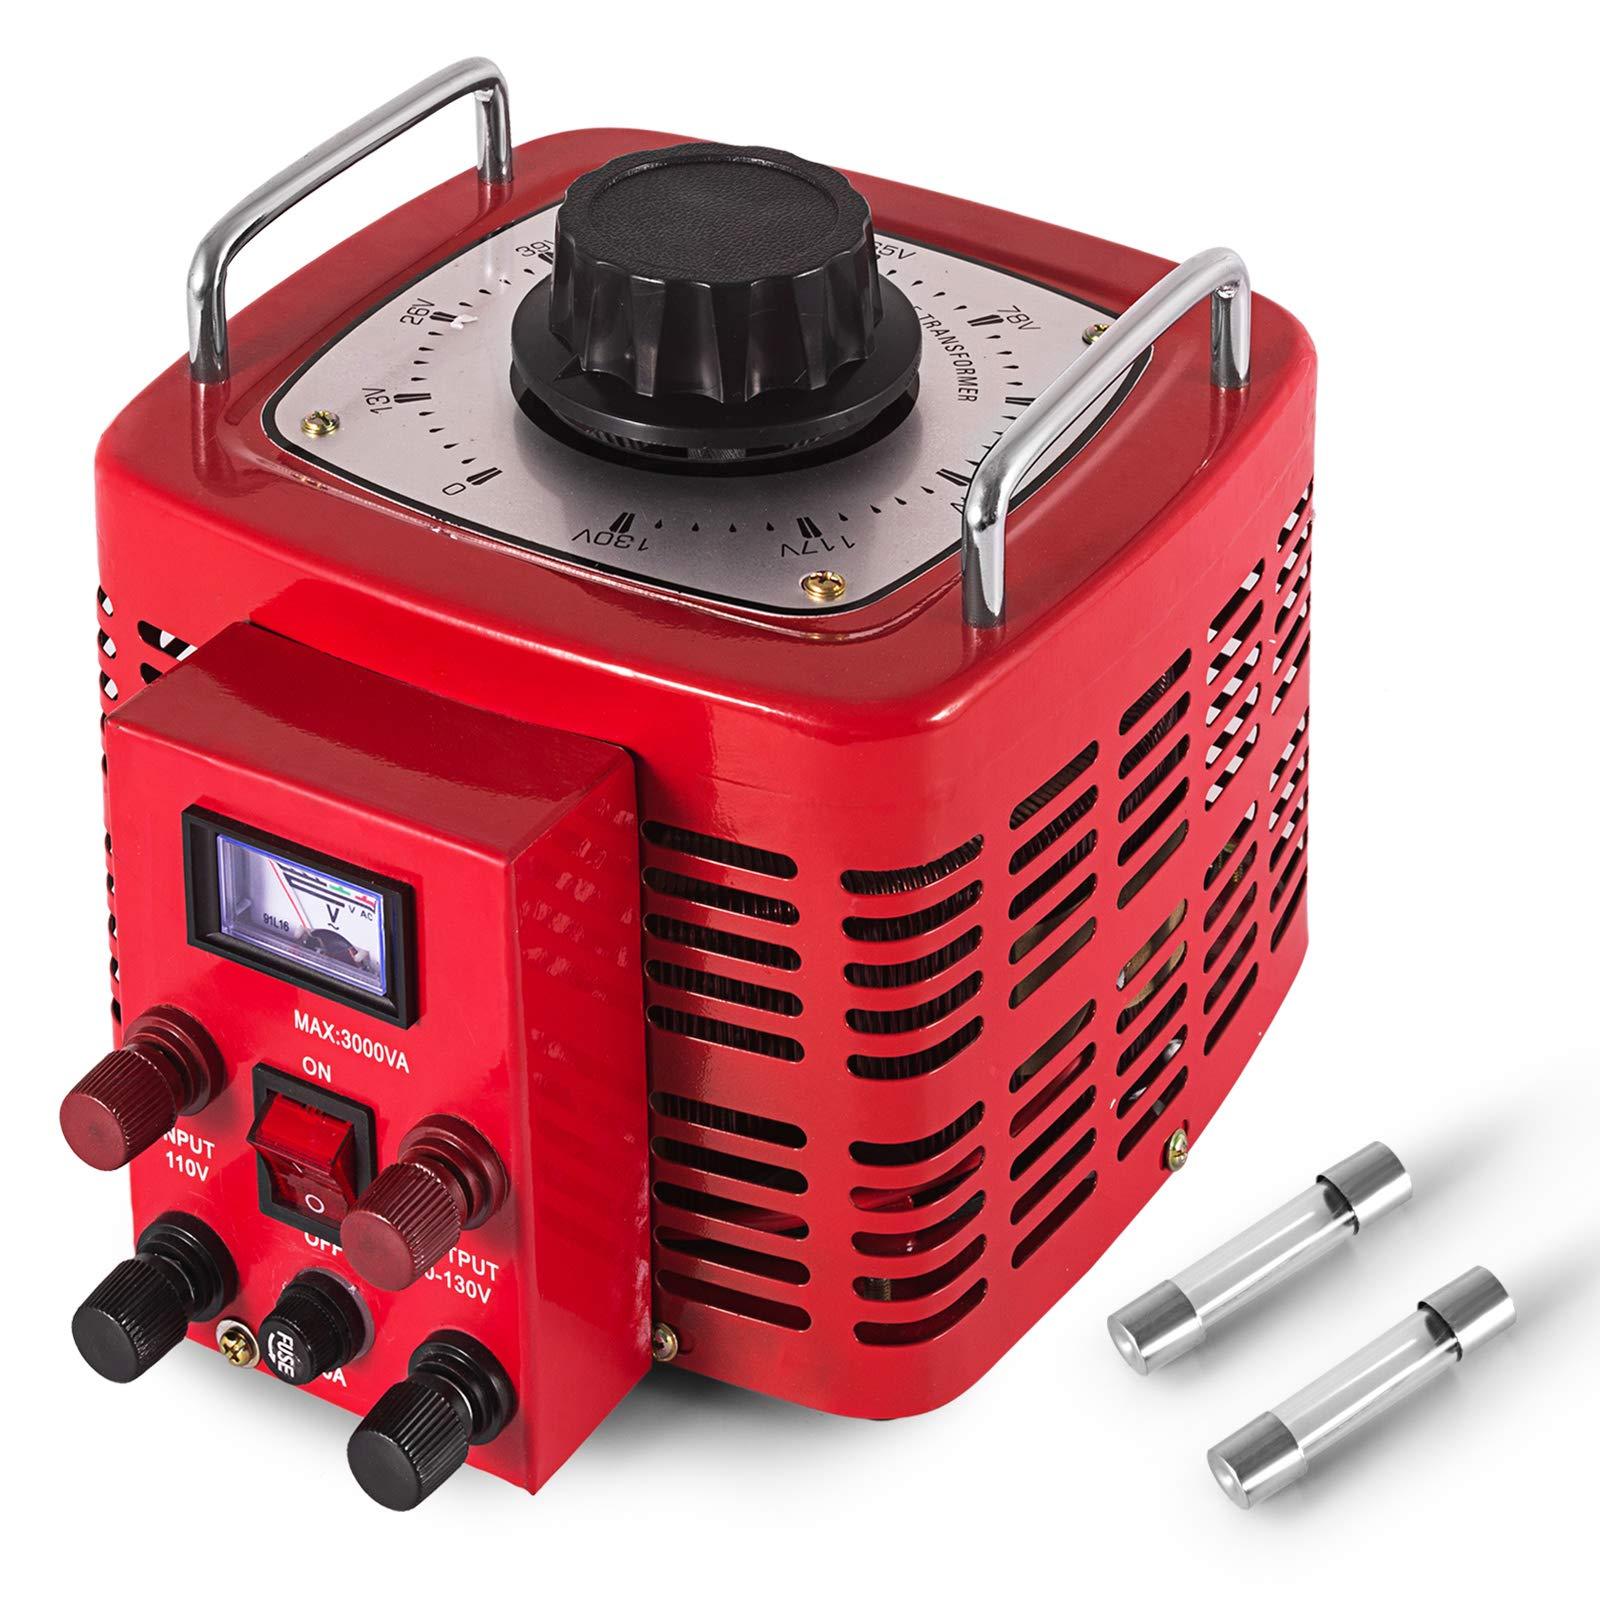 VEVOR 3KVA Transformer Max 30 Amp Variable Transformer 0~130 Volt Output Variable AC Voltage Regulator for Industries Equipment Appliances